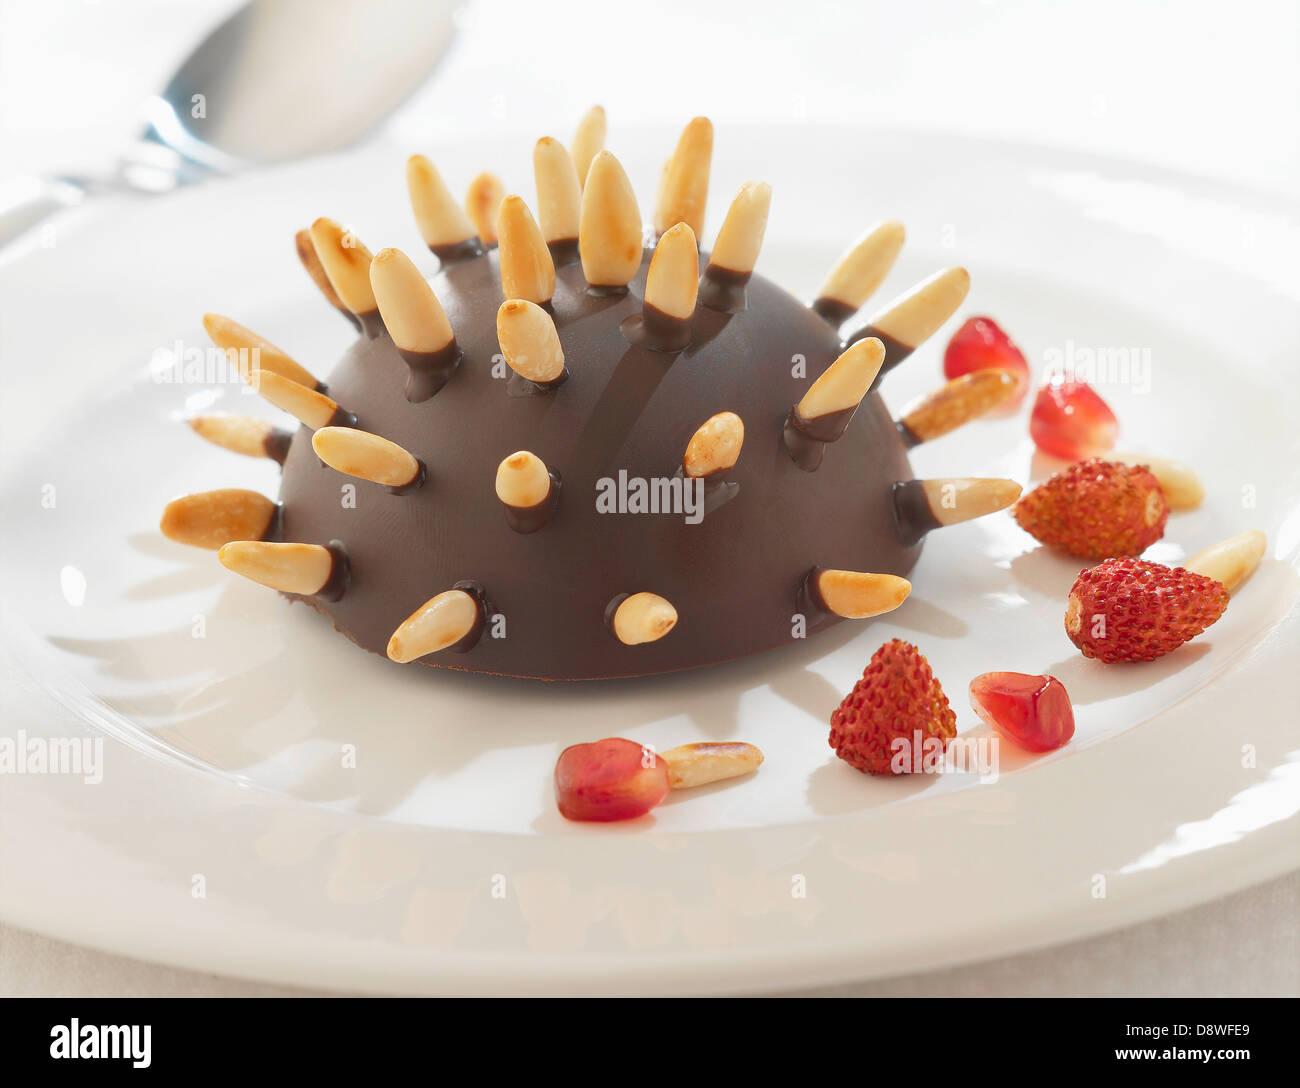 Hedgehog-shaped Mikado cake - Stock Image